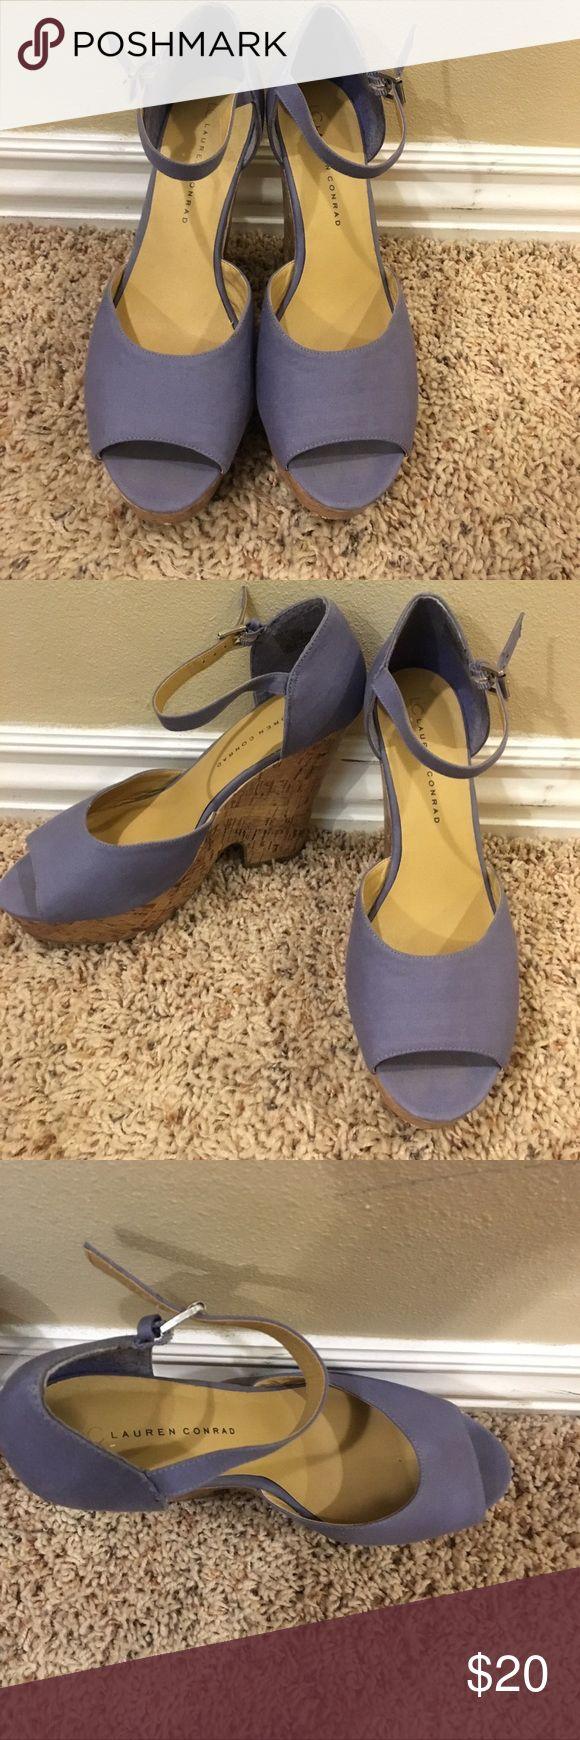 Purple wedges Purple Lauren Conrad shoes. Like new!! LC Lauren Conrad Shoes Wedges